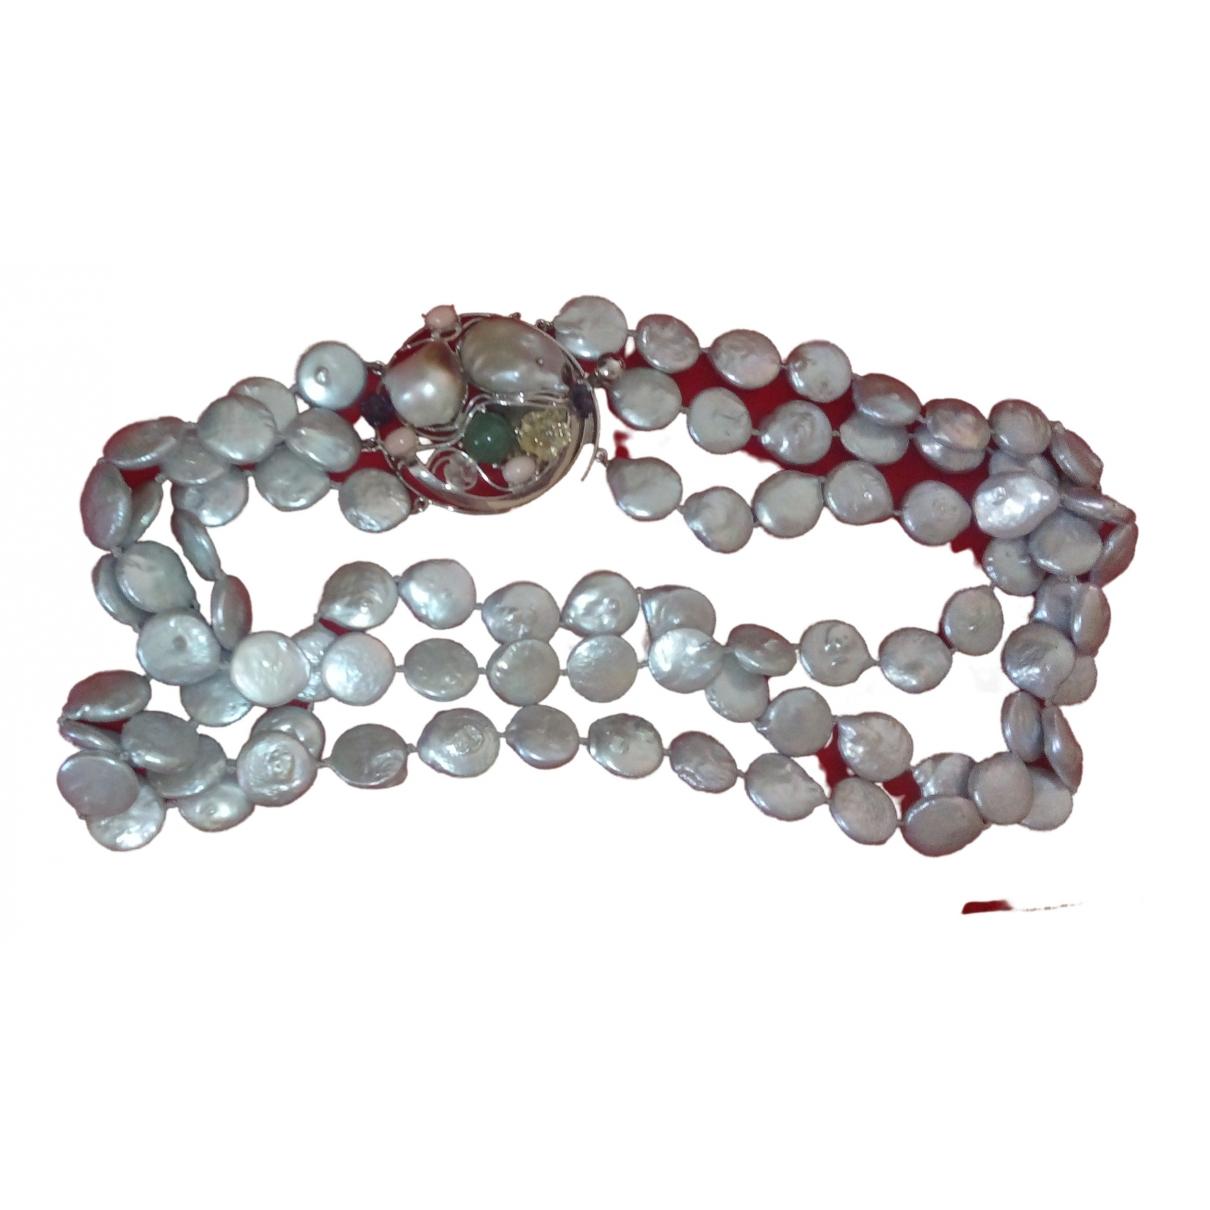 Non Signe / Unsigned \N Kette in  Grau Perle